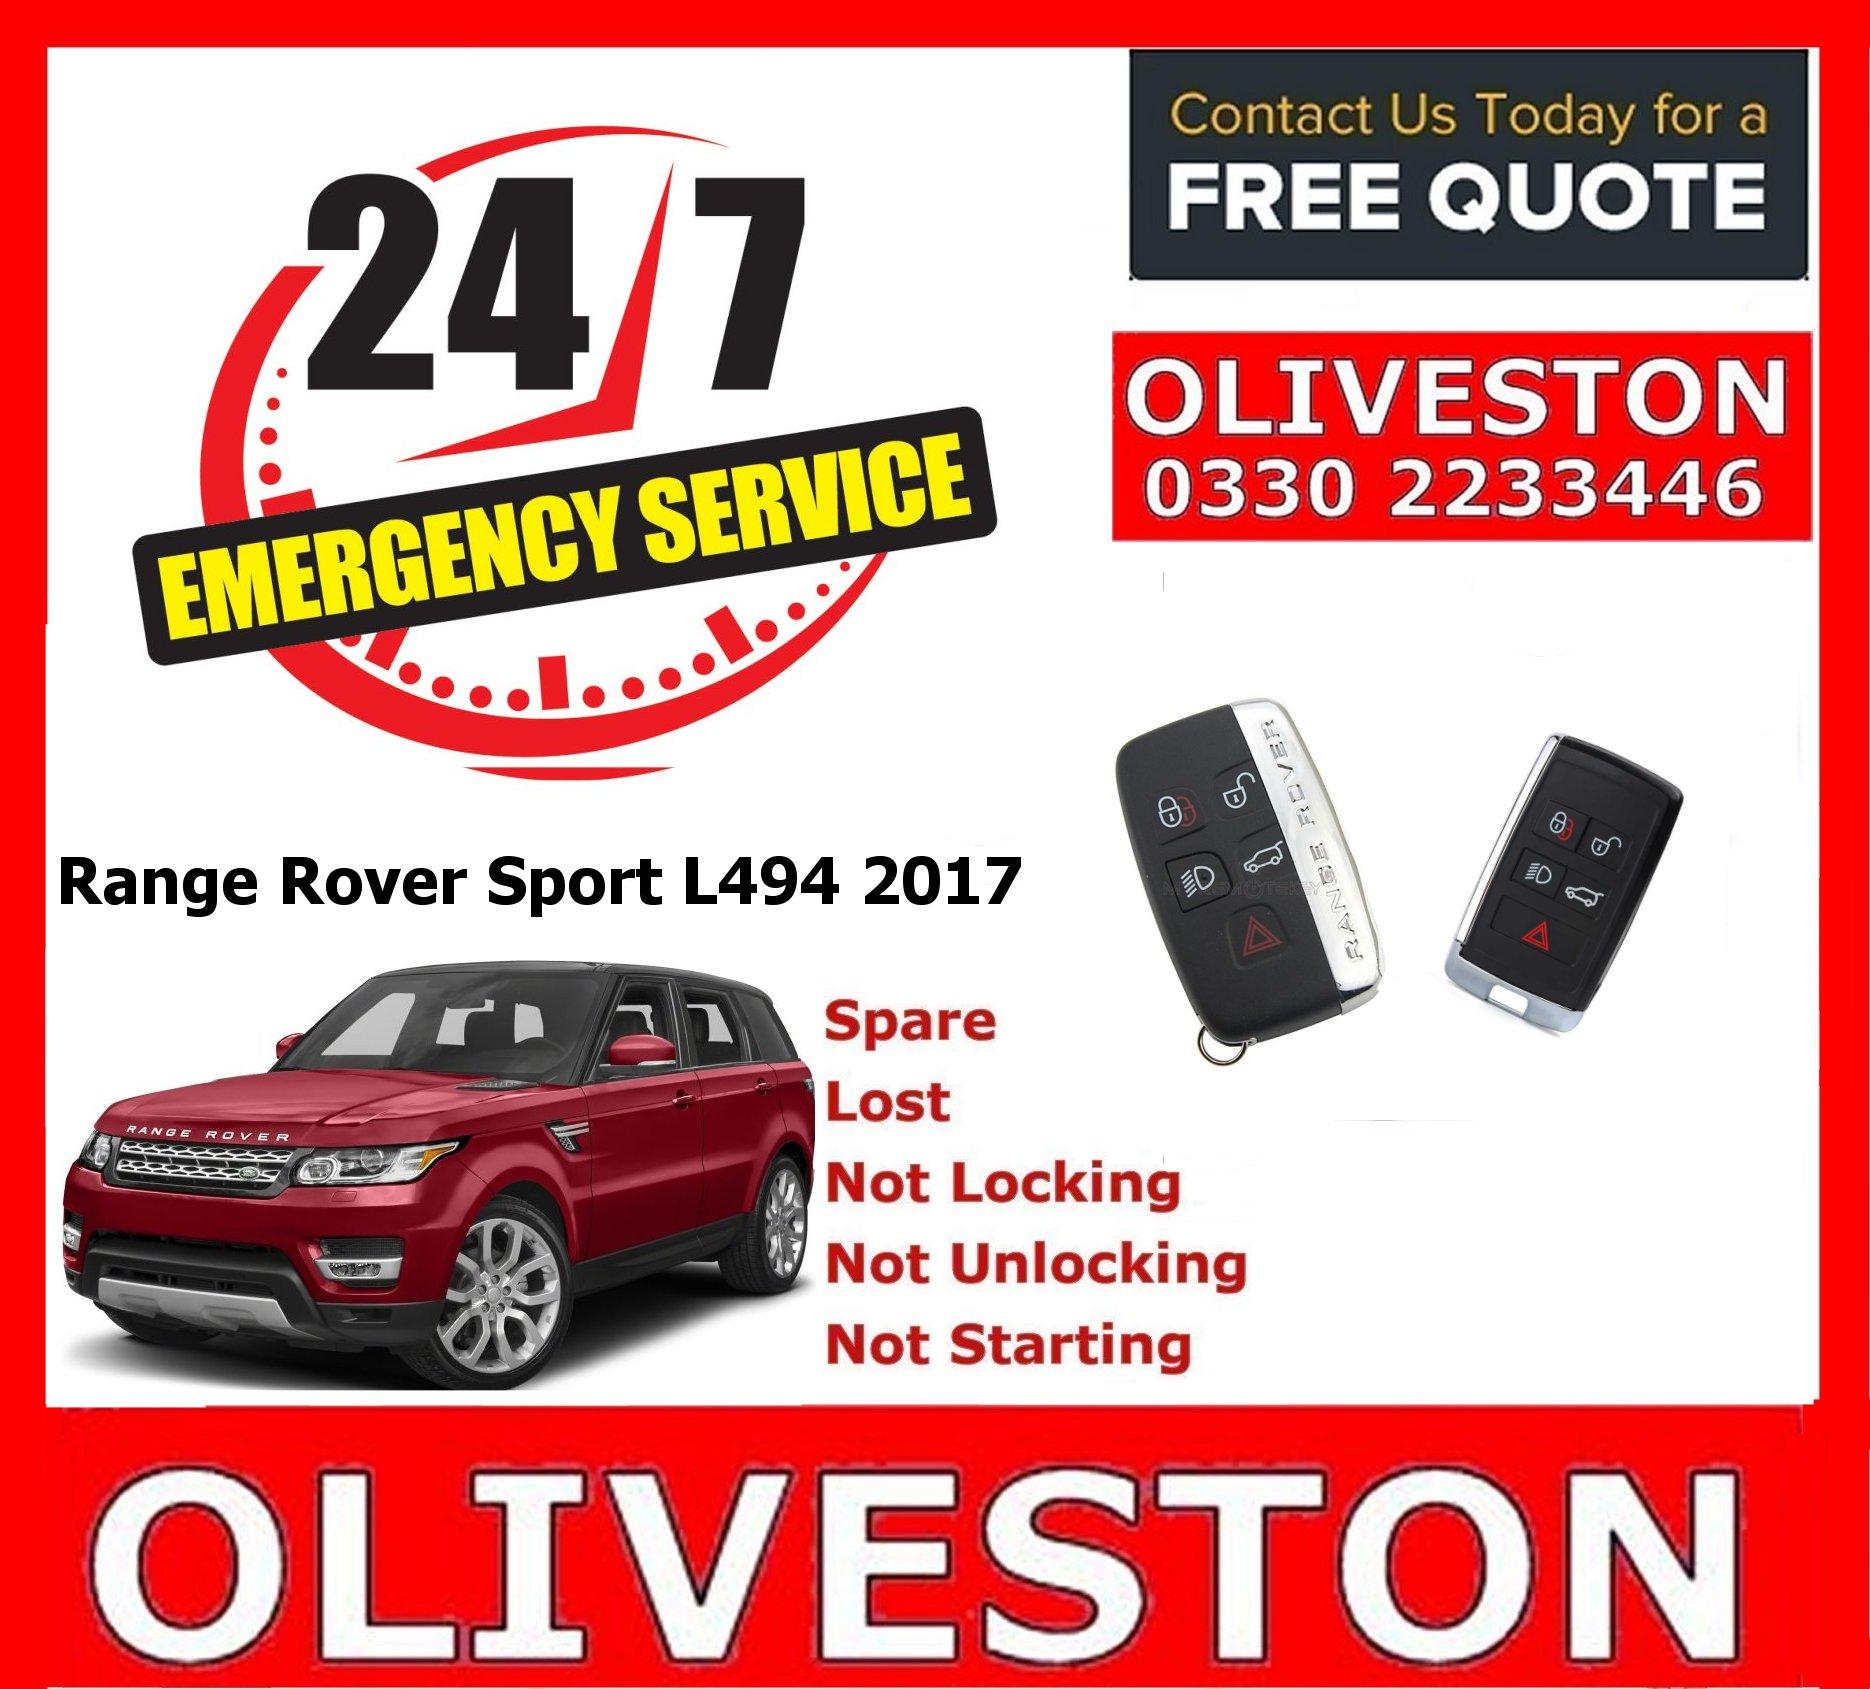 Range Rover Land Rover Jaguar Spare lost keys Rhosllanerchrugog Llandudno_Junction Mold Holywell Kinmel_Bay Abergele_Clwyd_Wales